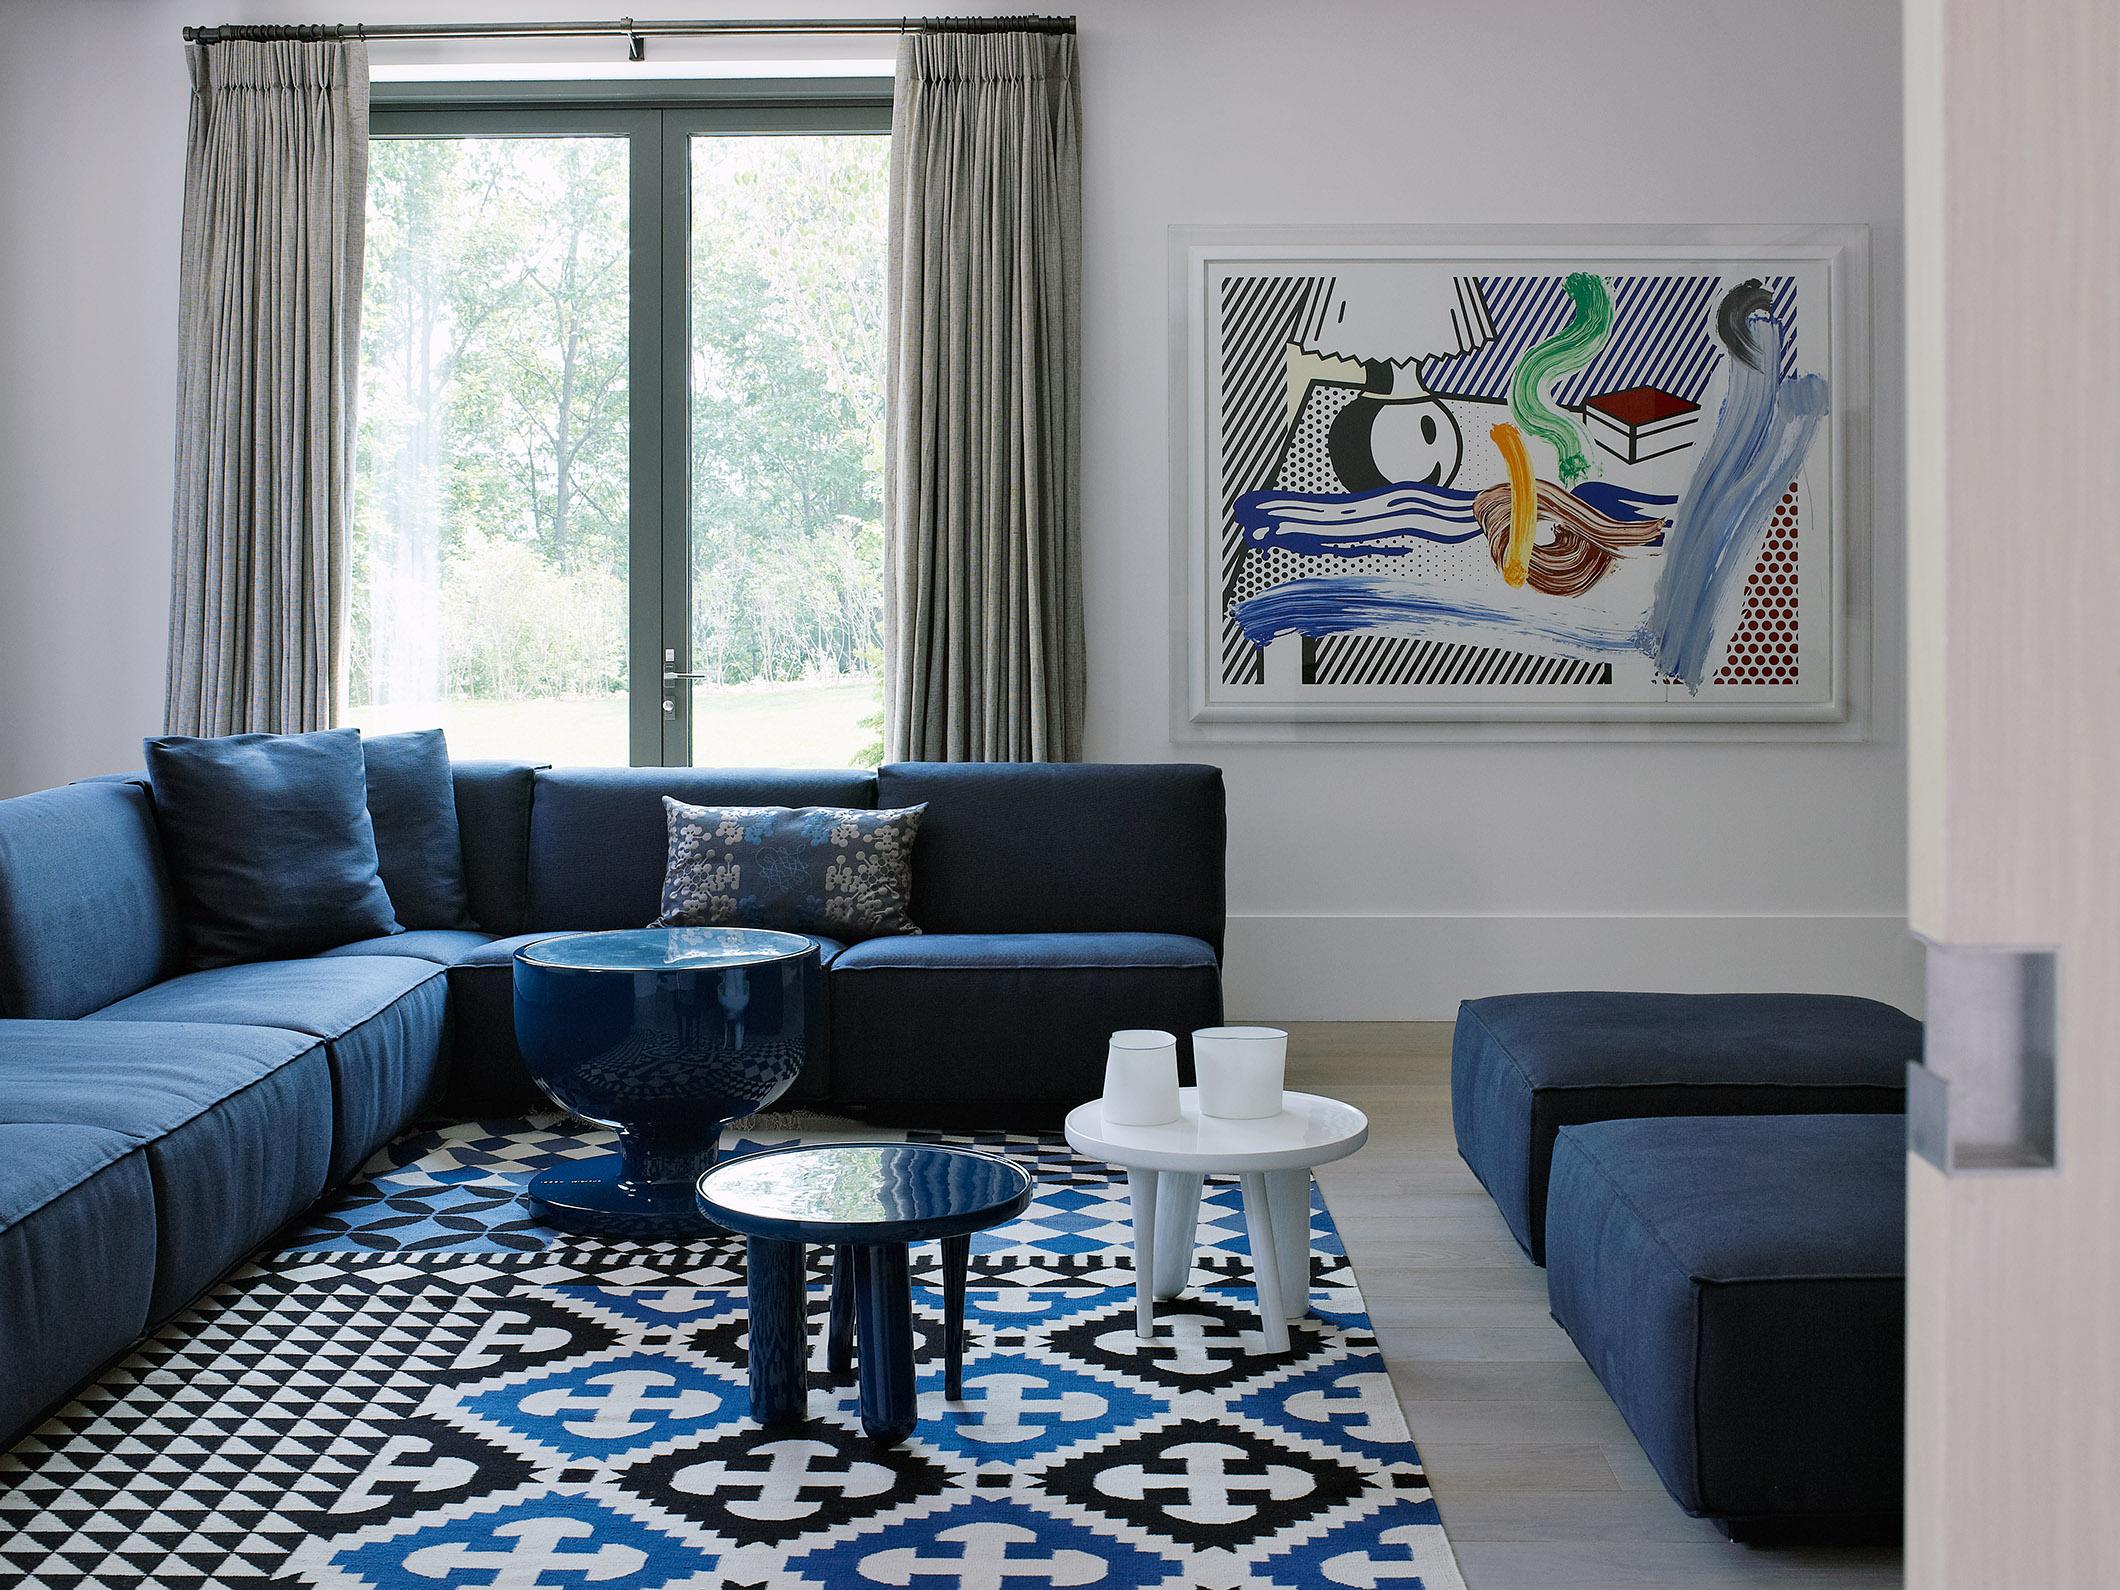 DOUTZEN sofa and pouf at Korean residential resort